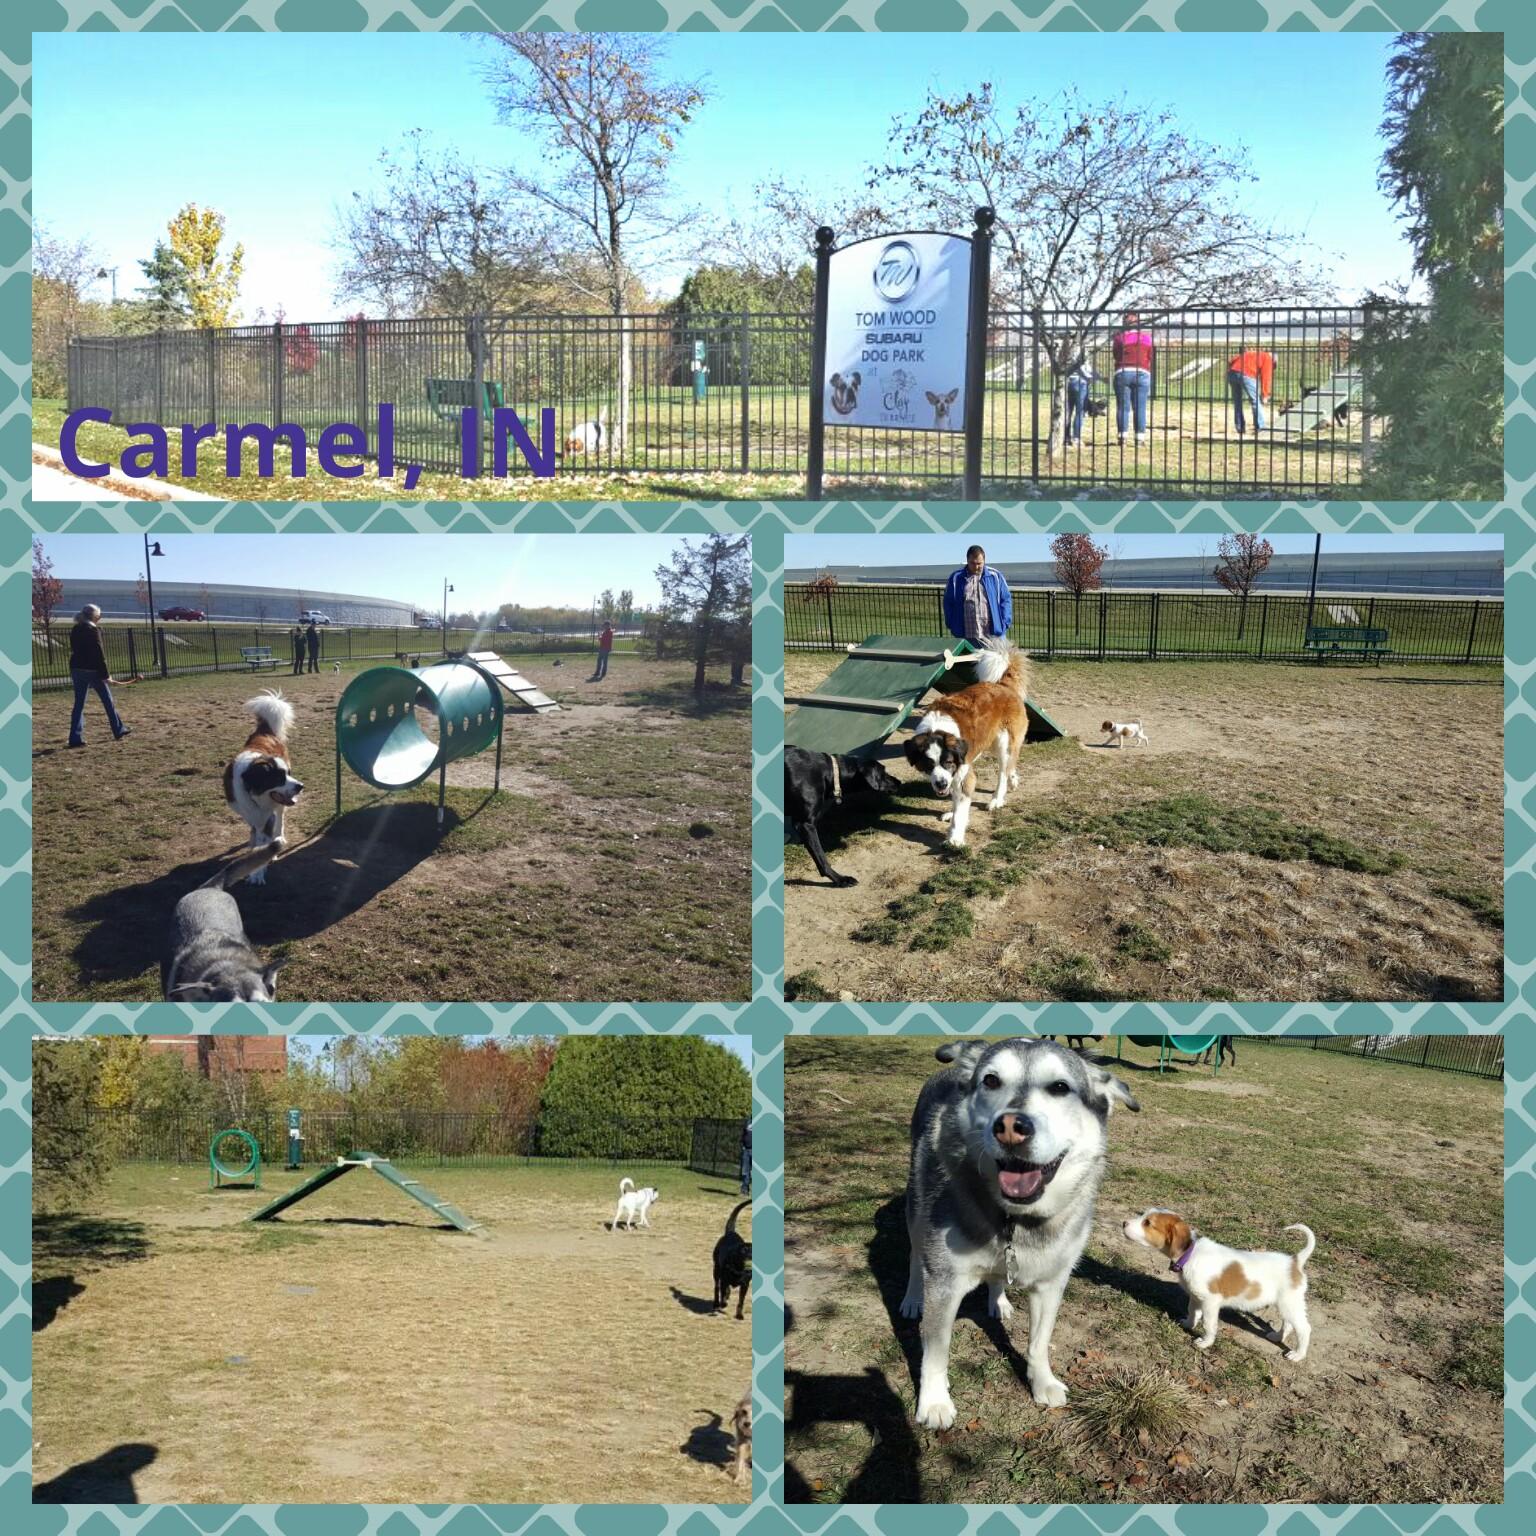 Tom wood subaru dog park